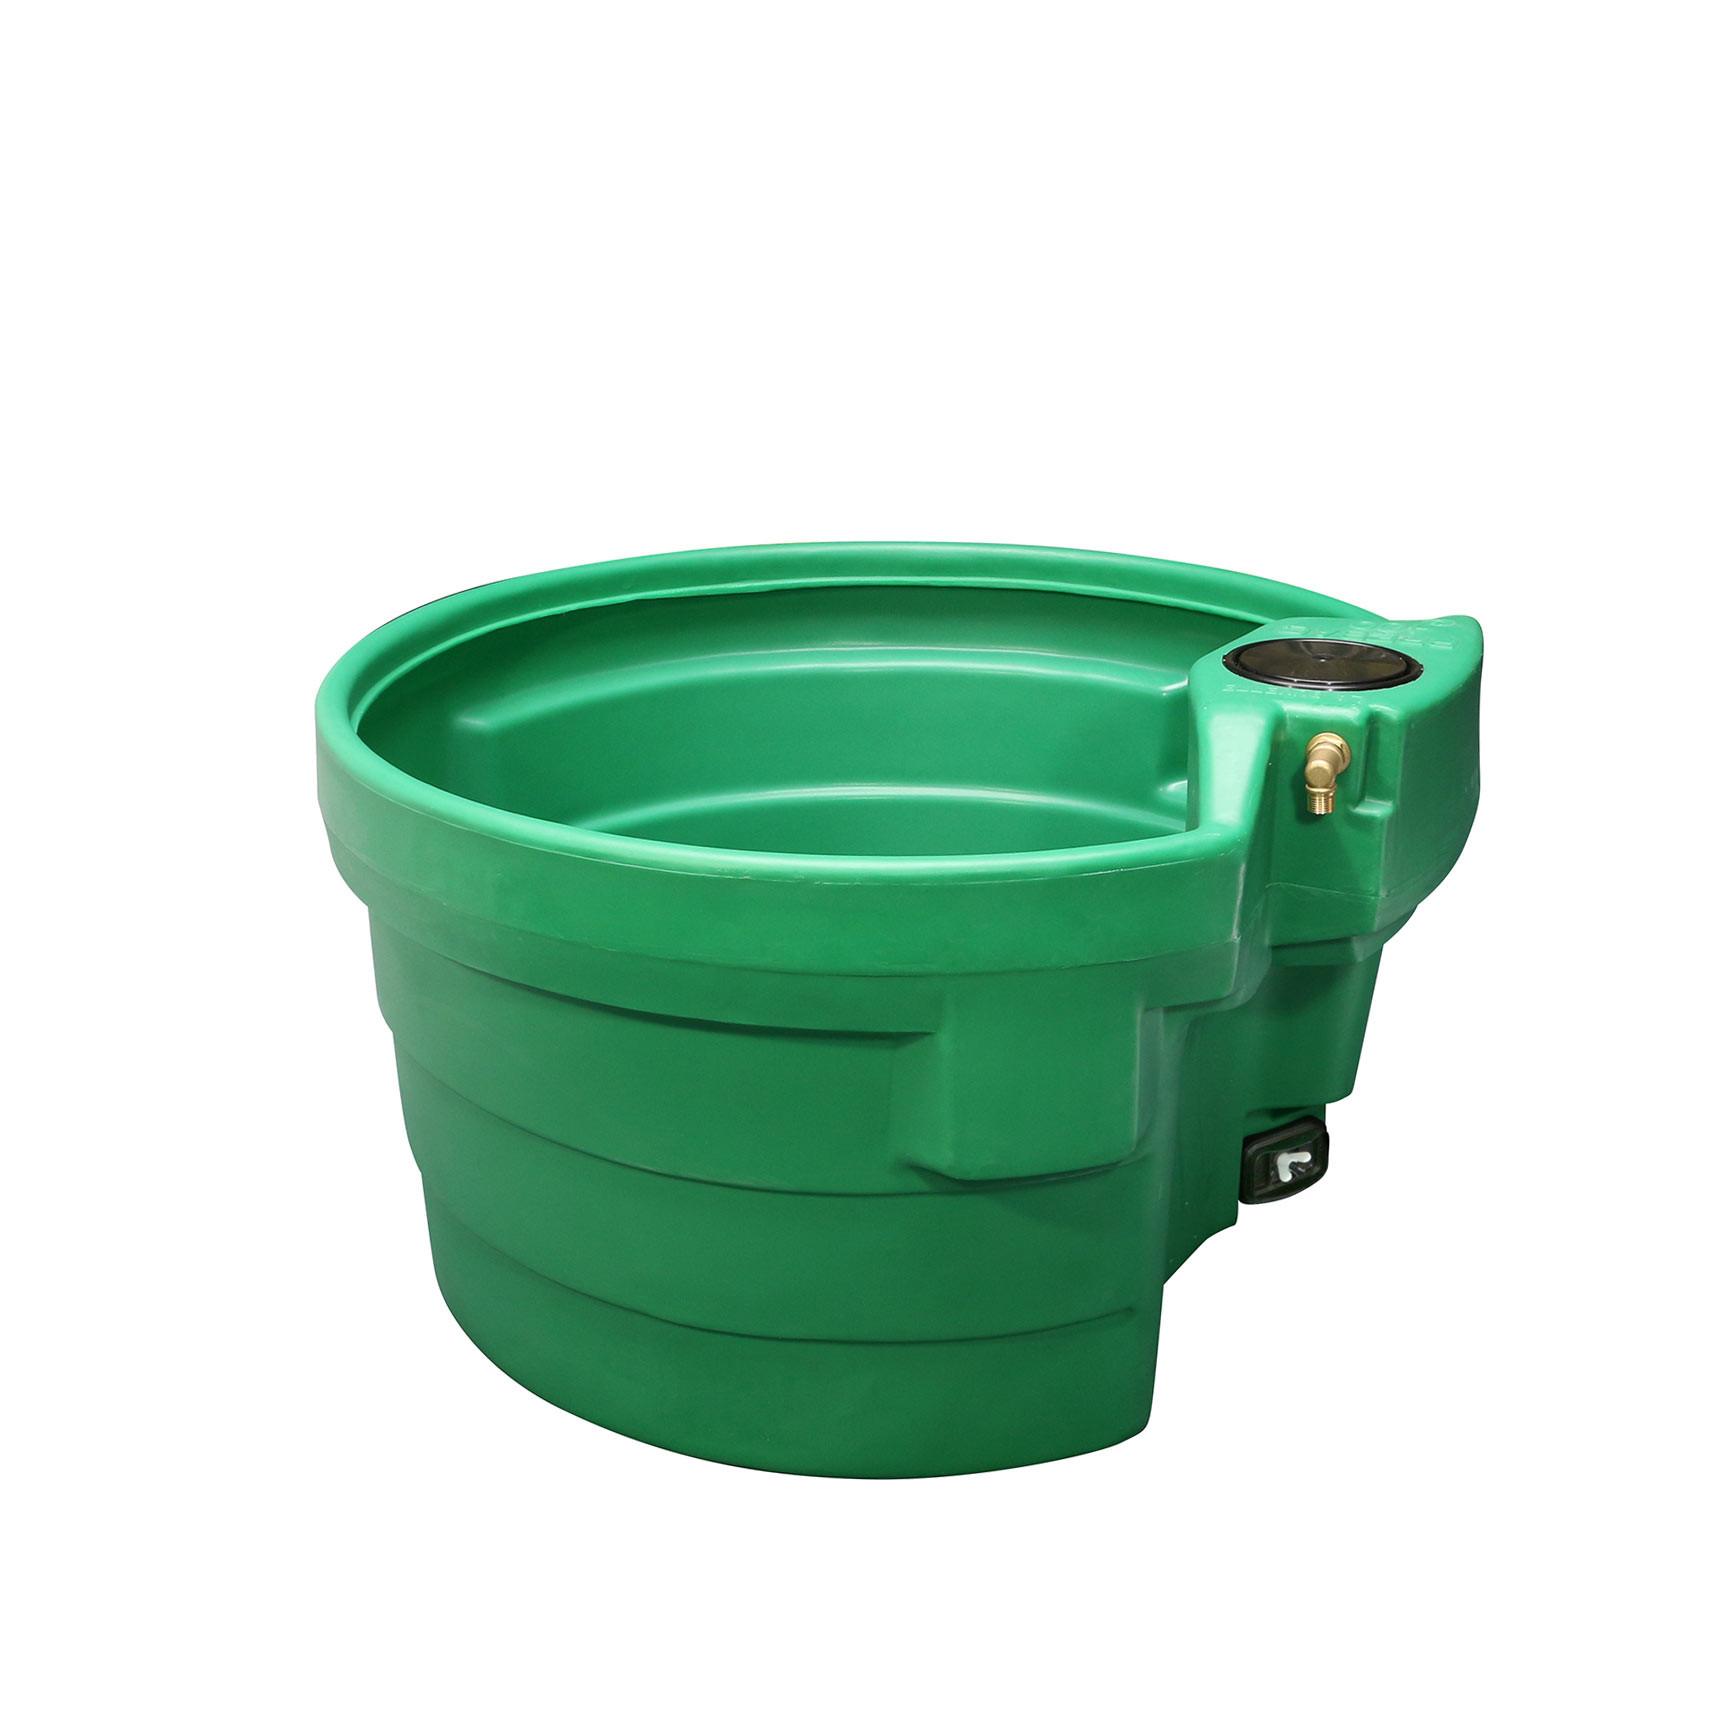 2221 PREBAC 400 litres bac abreuvoir pâturage